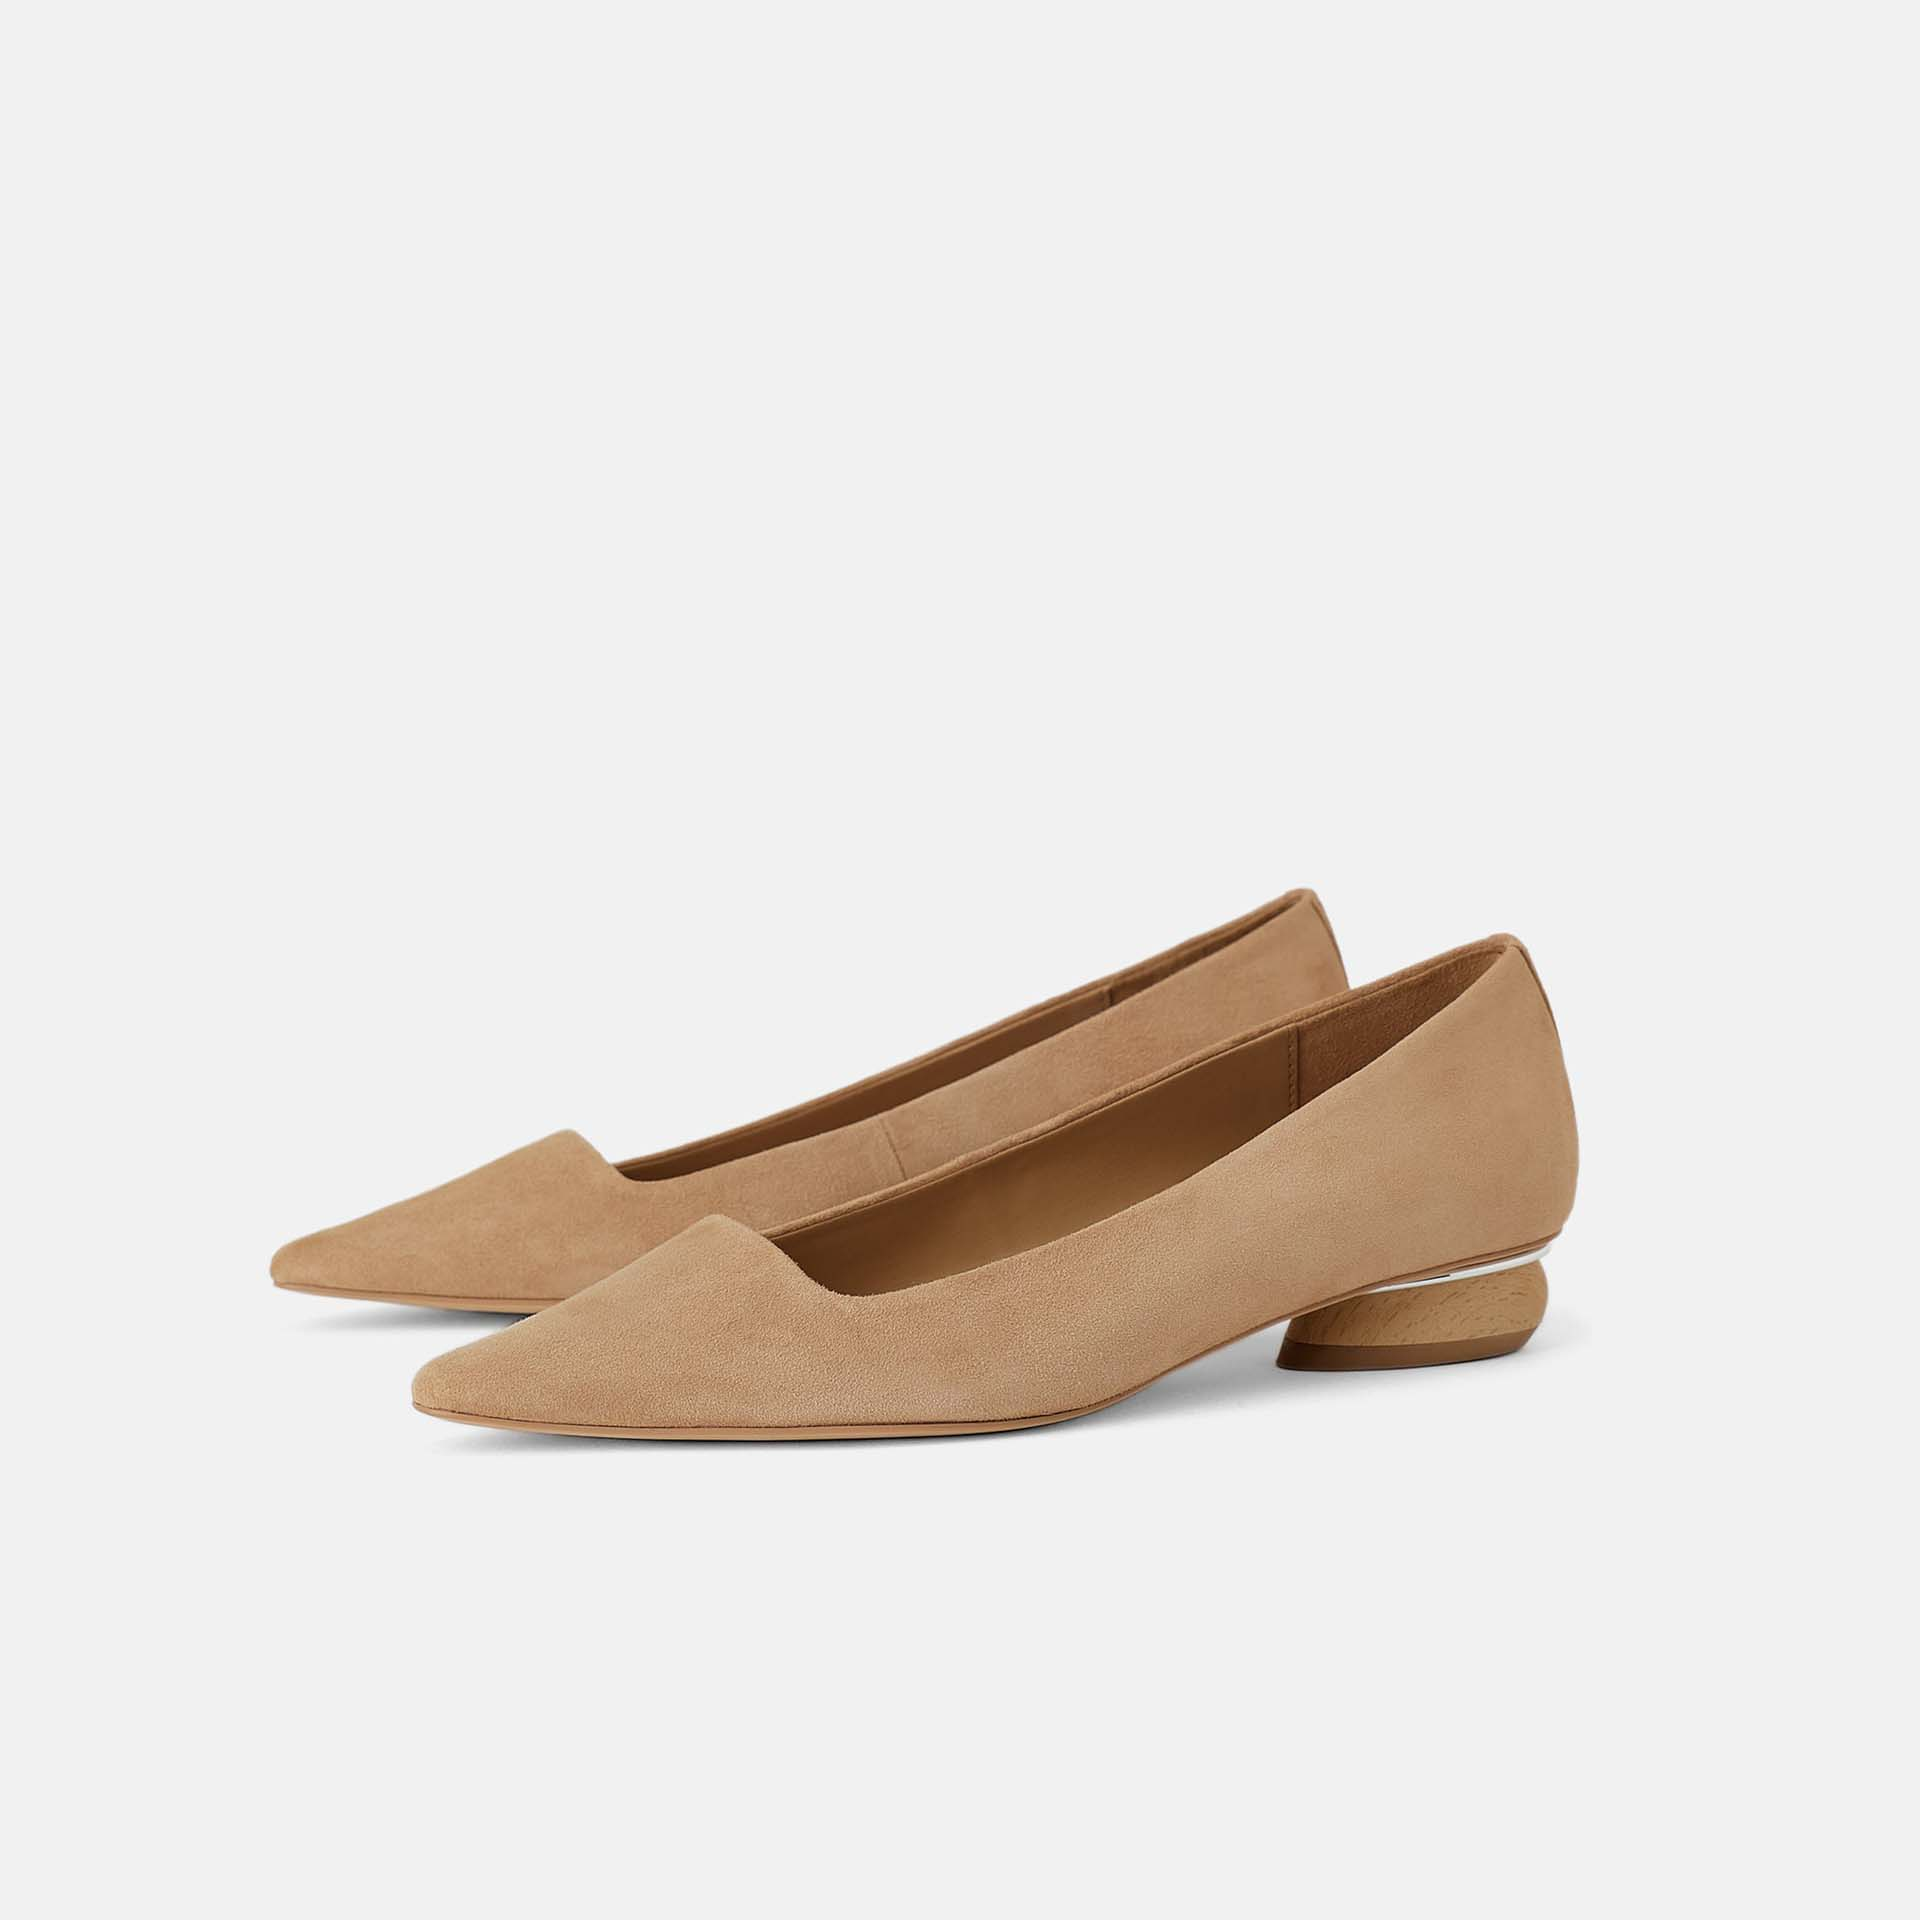 Zara-flatshoes